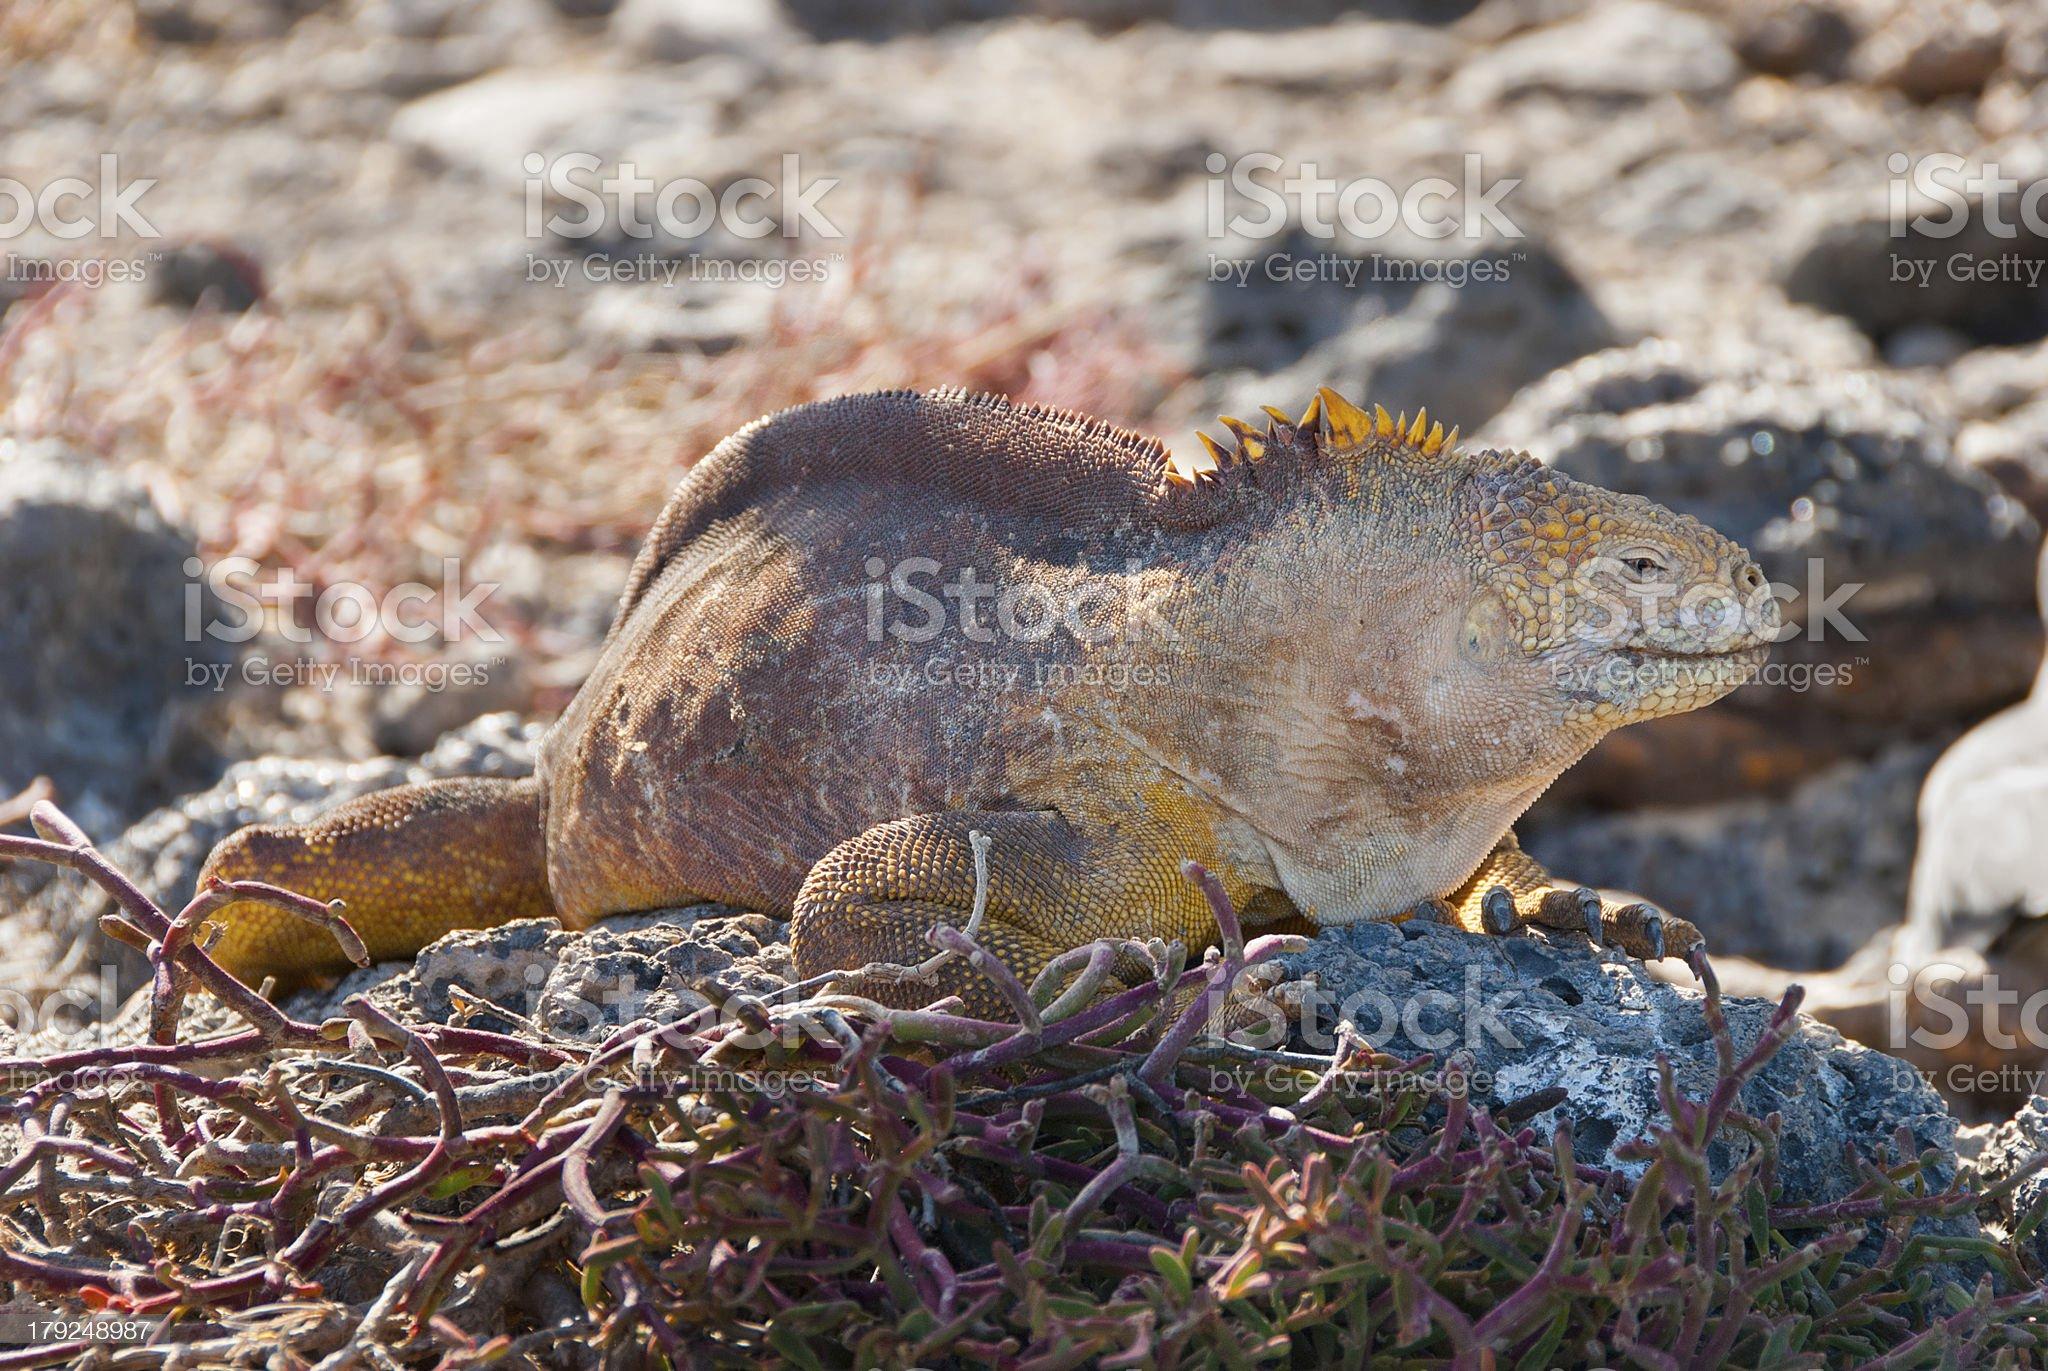 Galapagos Land Iguanas royalty-free stock photo